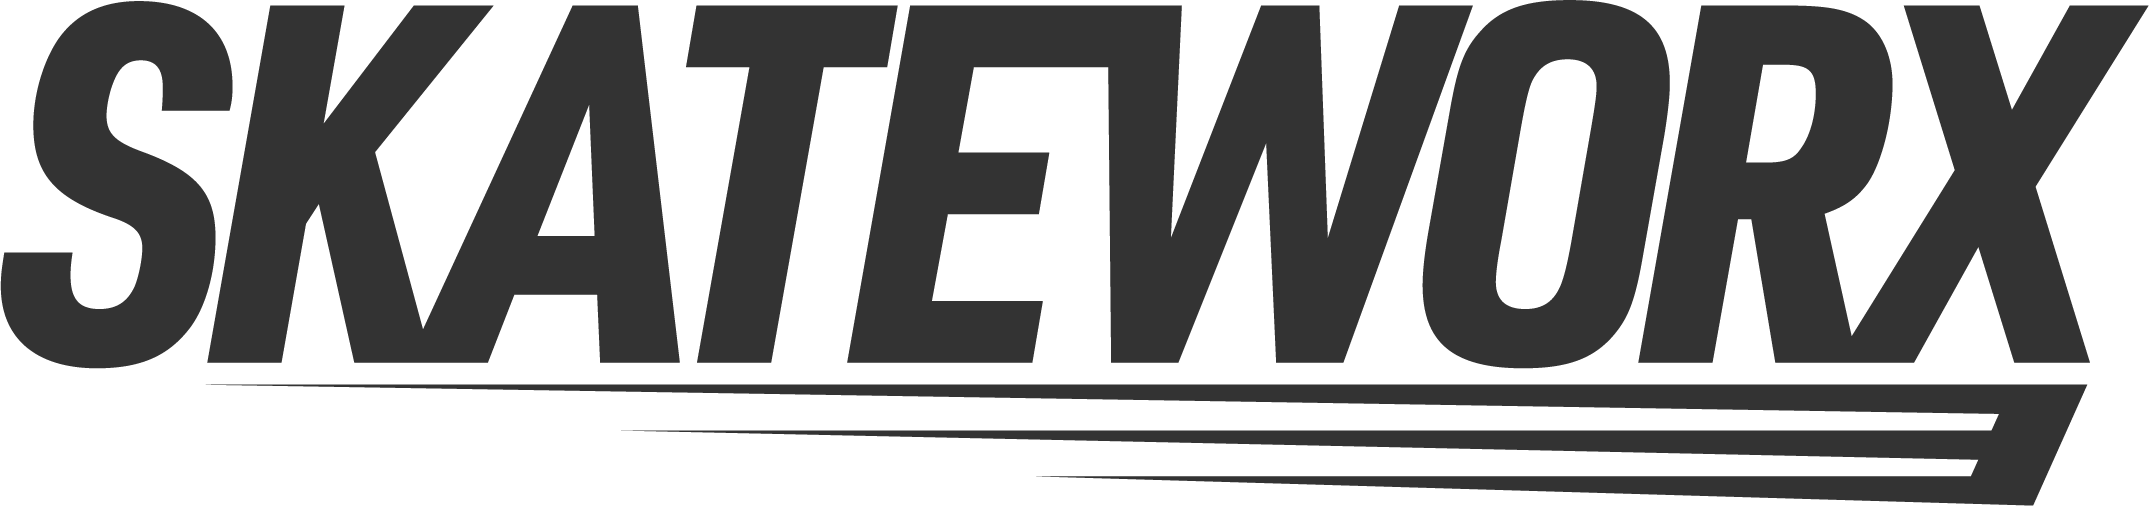 Skateworx.ca